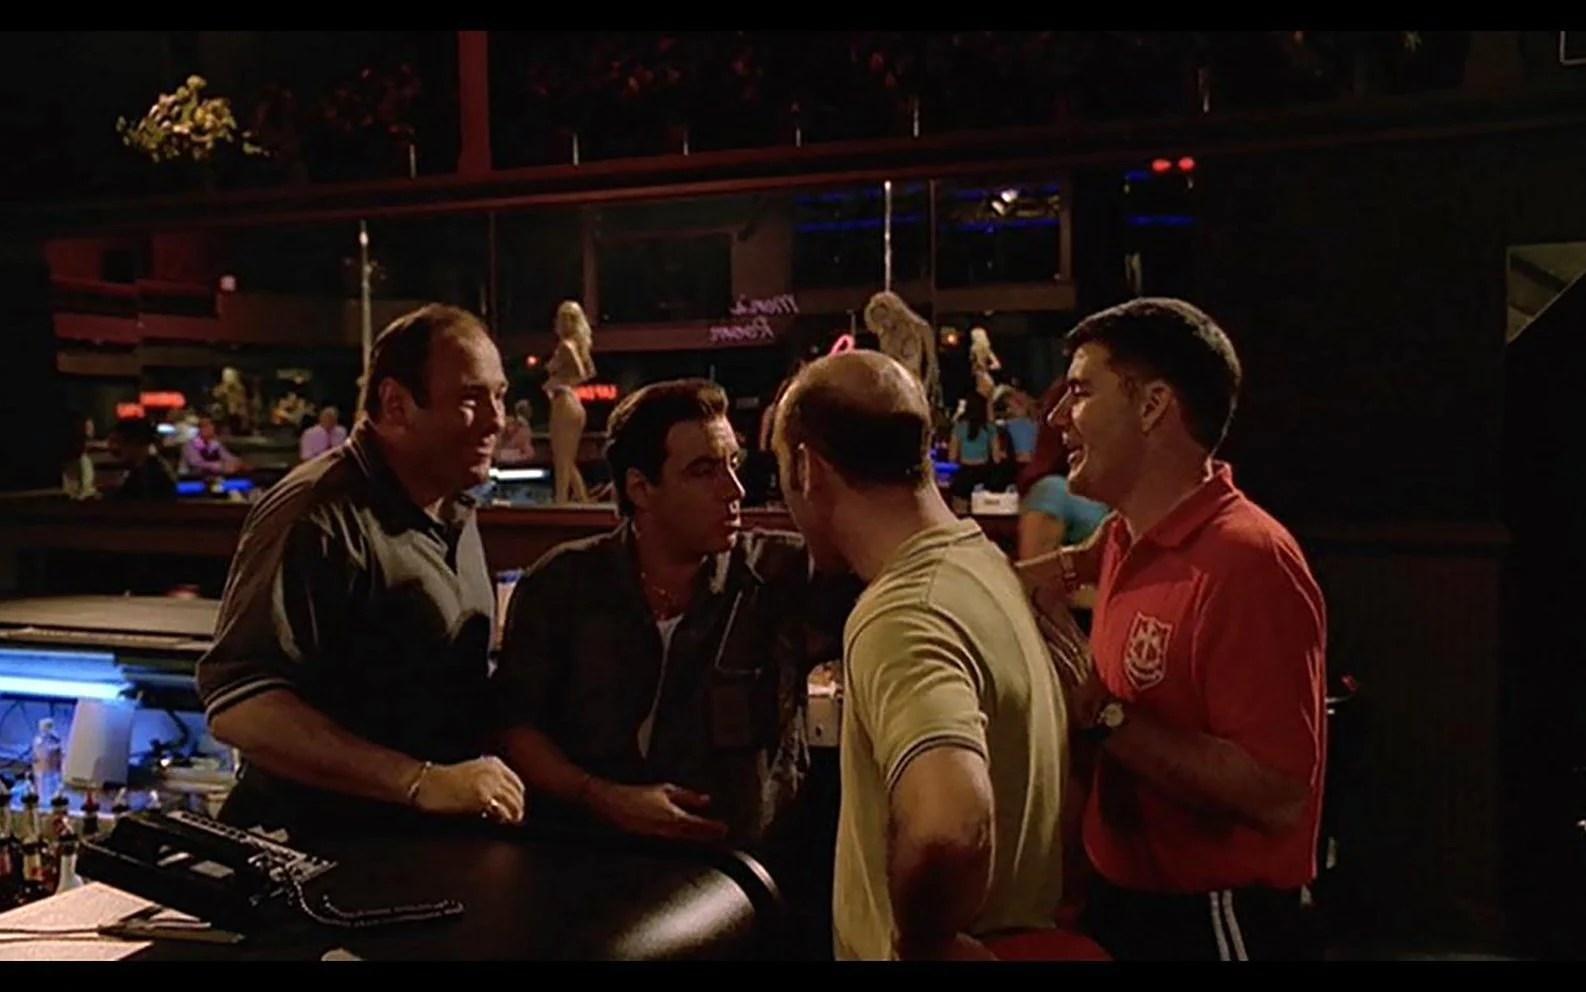 James Gandolfini (far left) as Tony Soprano in the fictional Bada Bing club